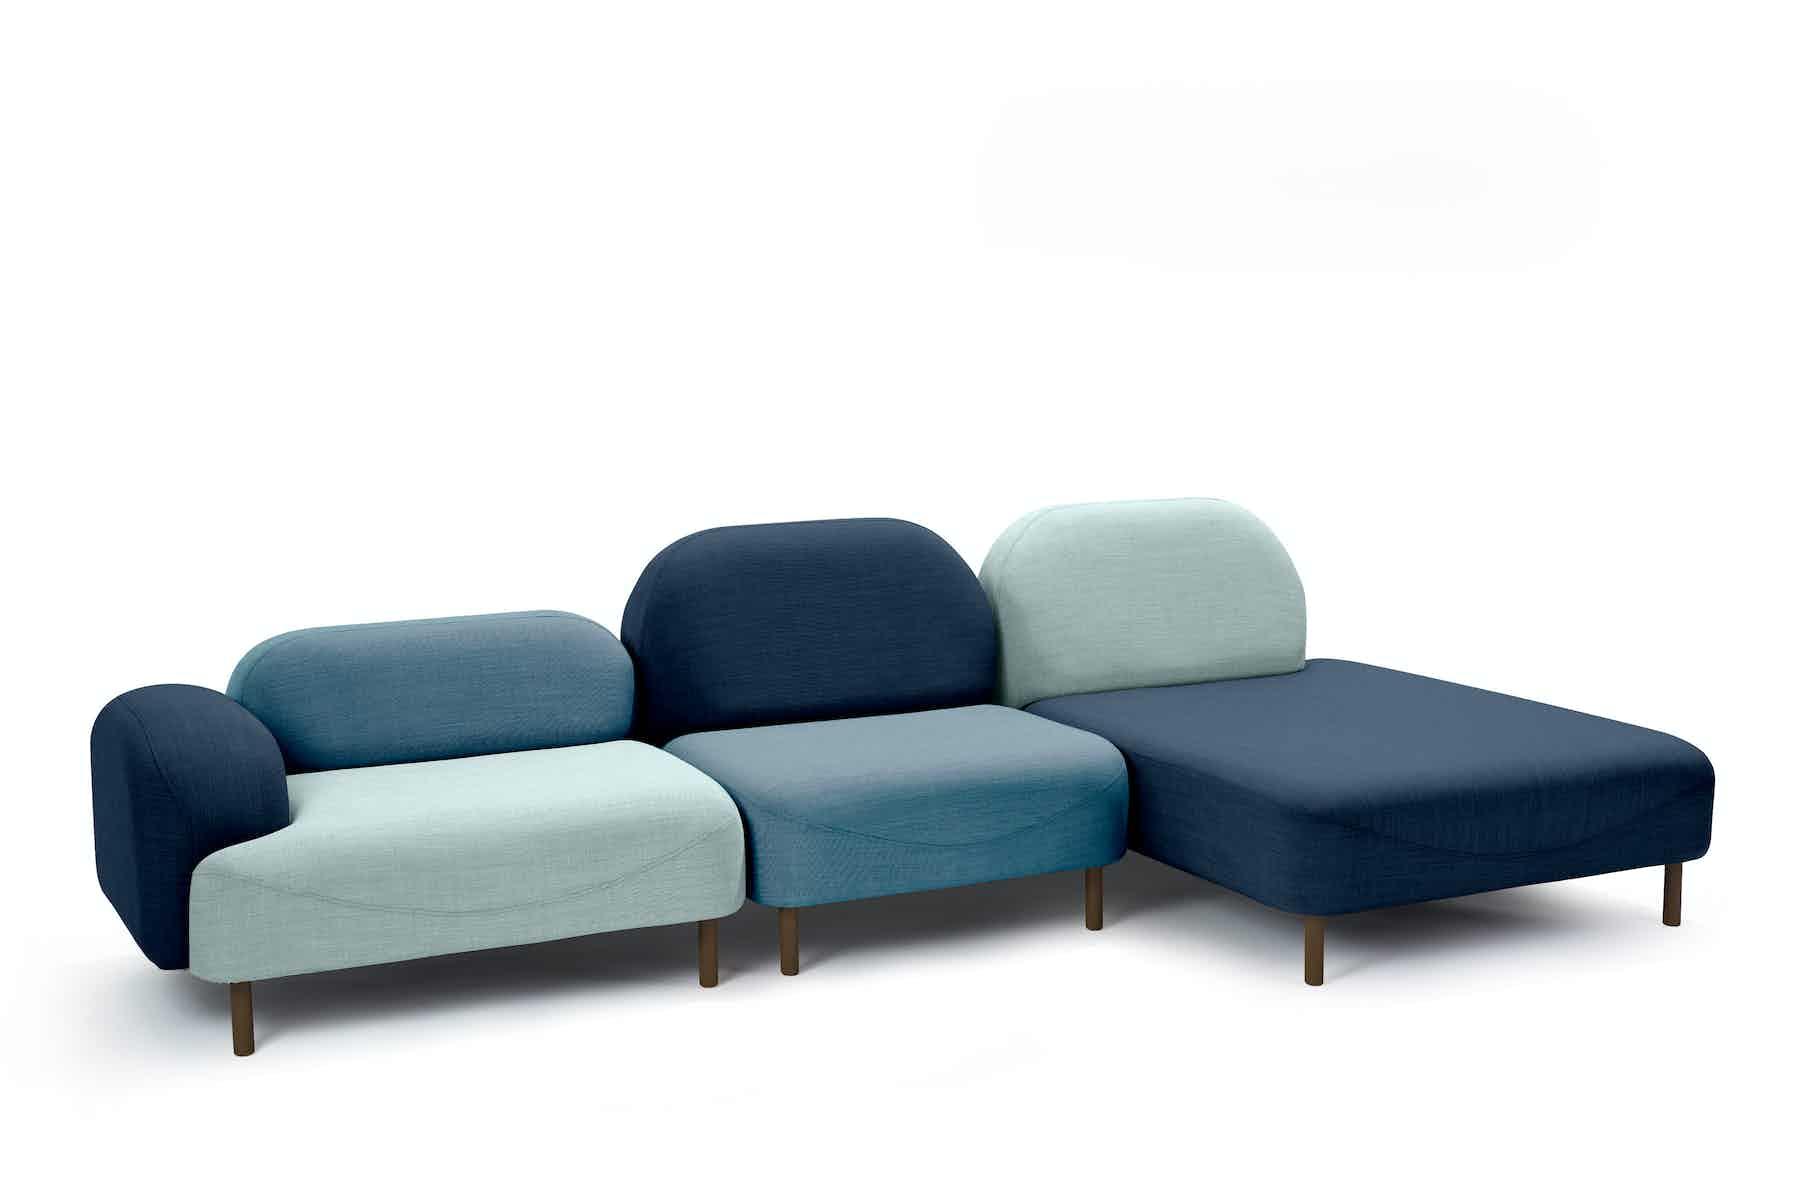 Deadgood-scafell-modular-sofa-blues-haute-living